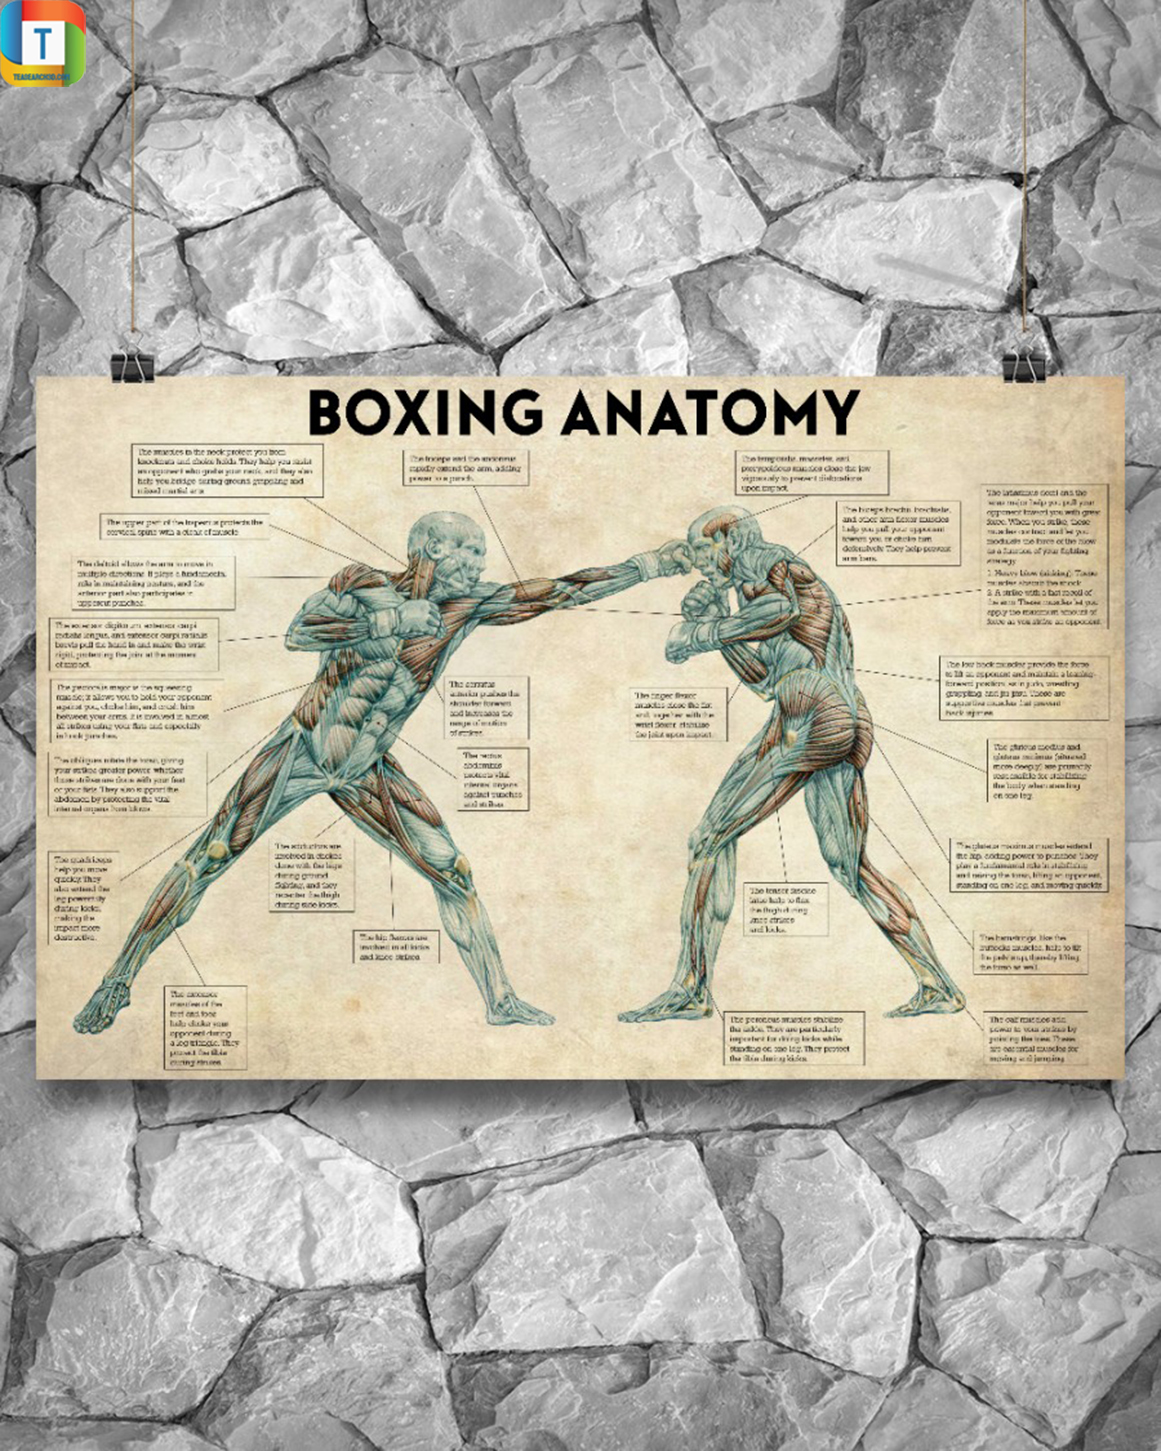 Boxing Anatomy Horizontal Poster 2